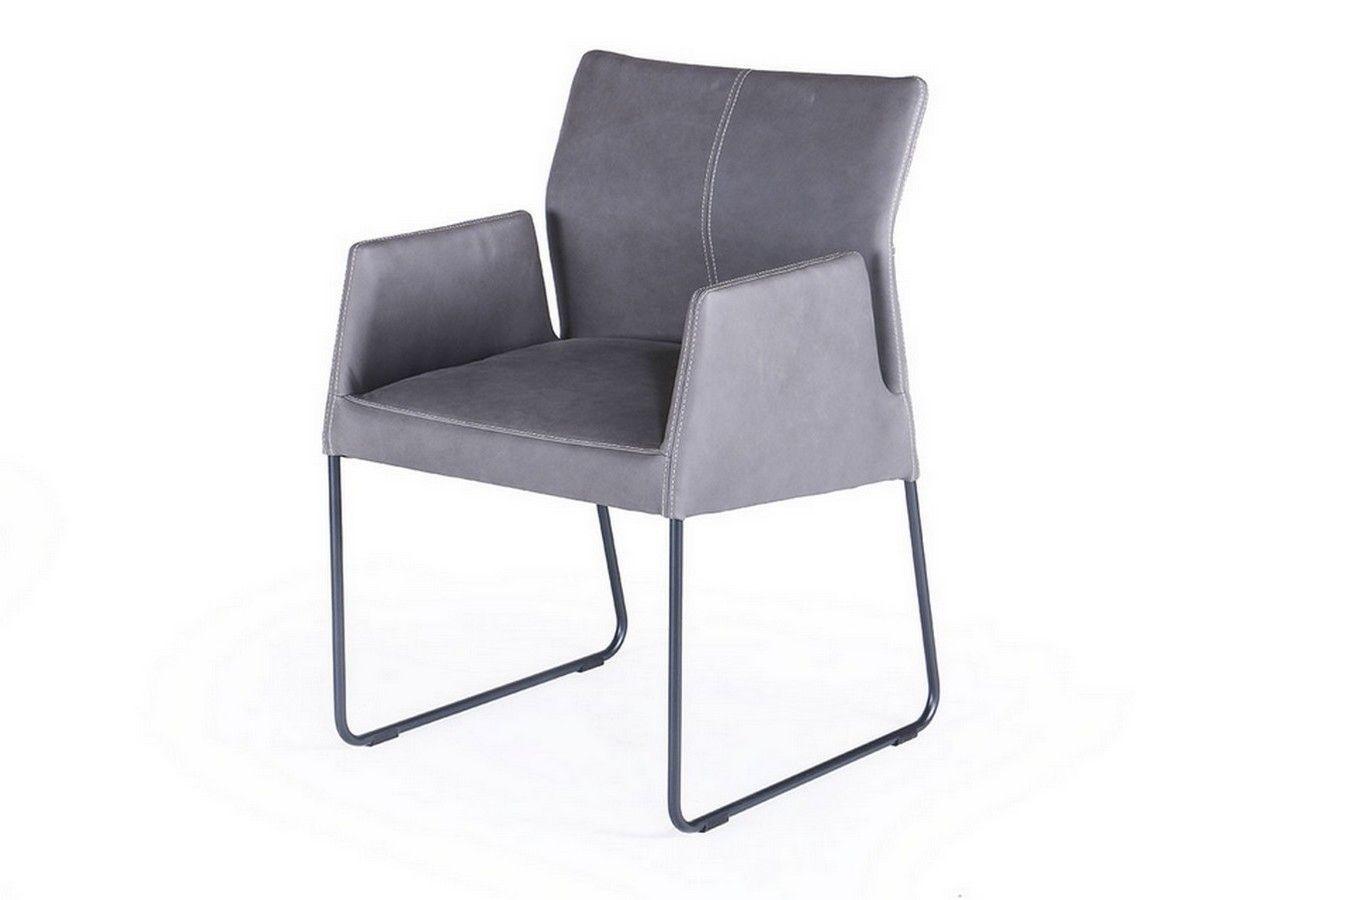 Designer Armlehnstuhl Leder Grau Online Bestellen Bei Lagerhaus De Armlehnstuhl Leder Armlehnstuhl Stuhle